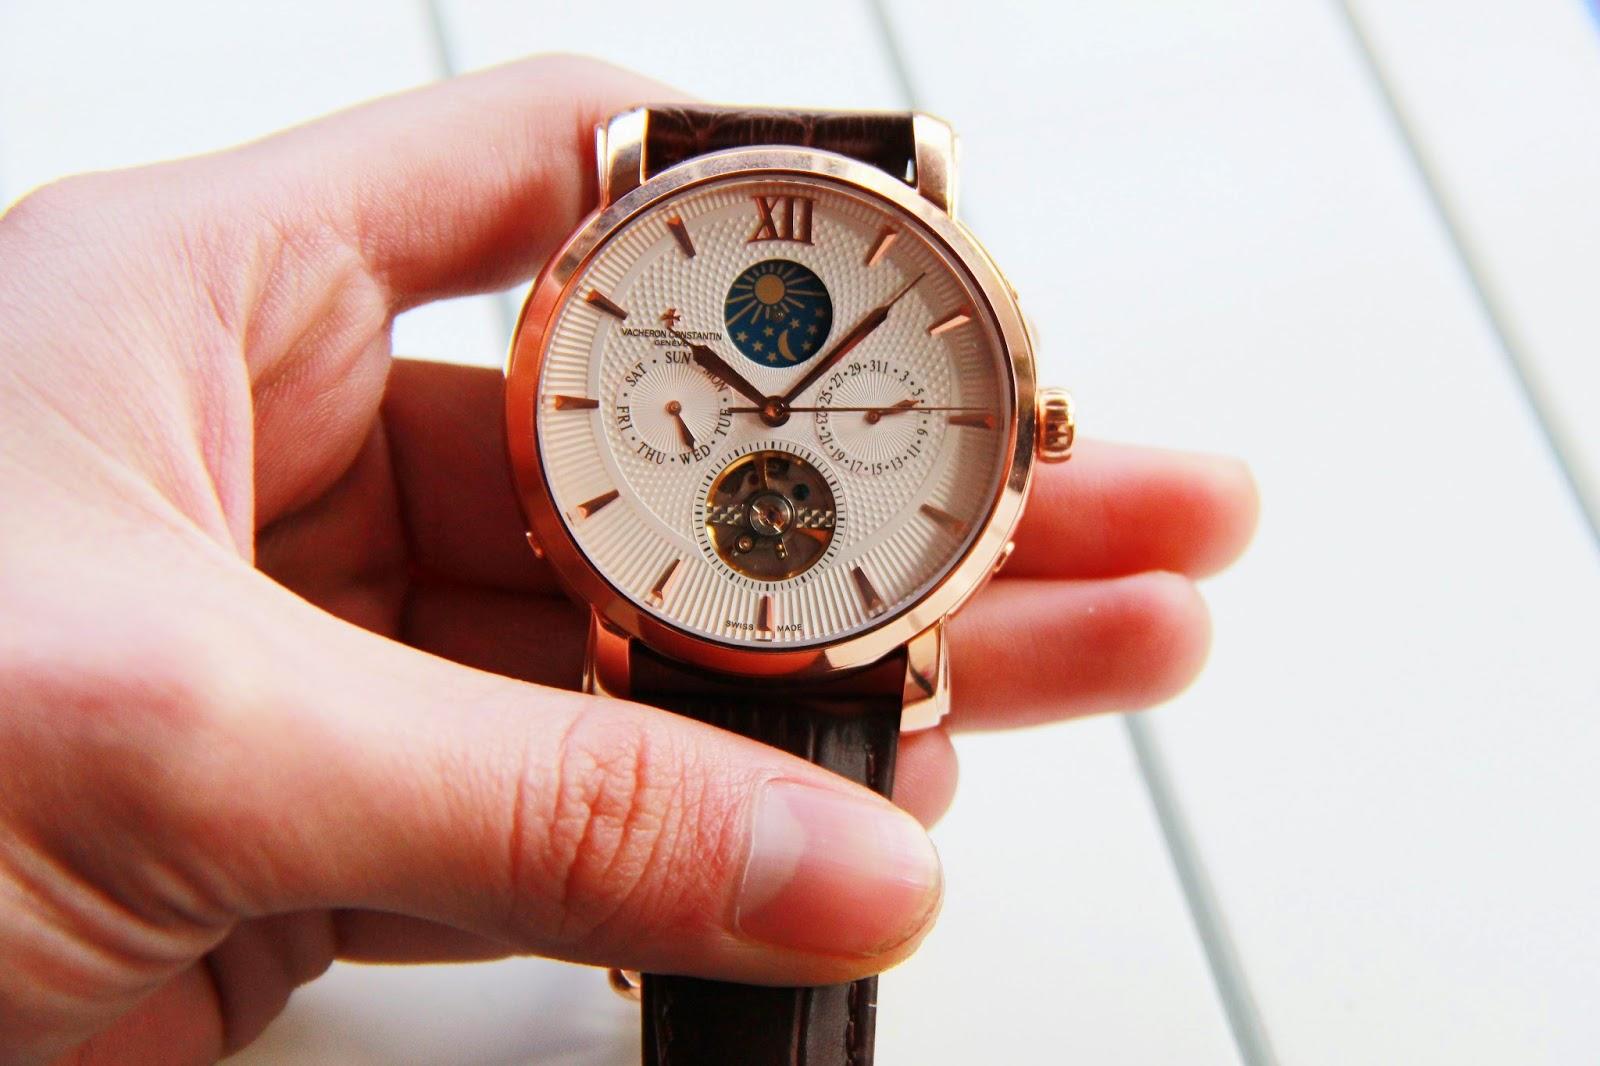 Đồng hồ Vacheron Constantin cao cấp